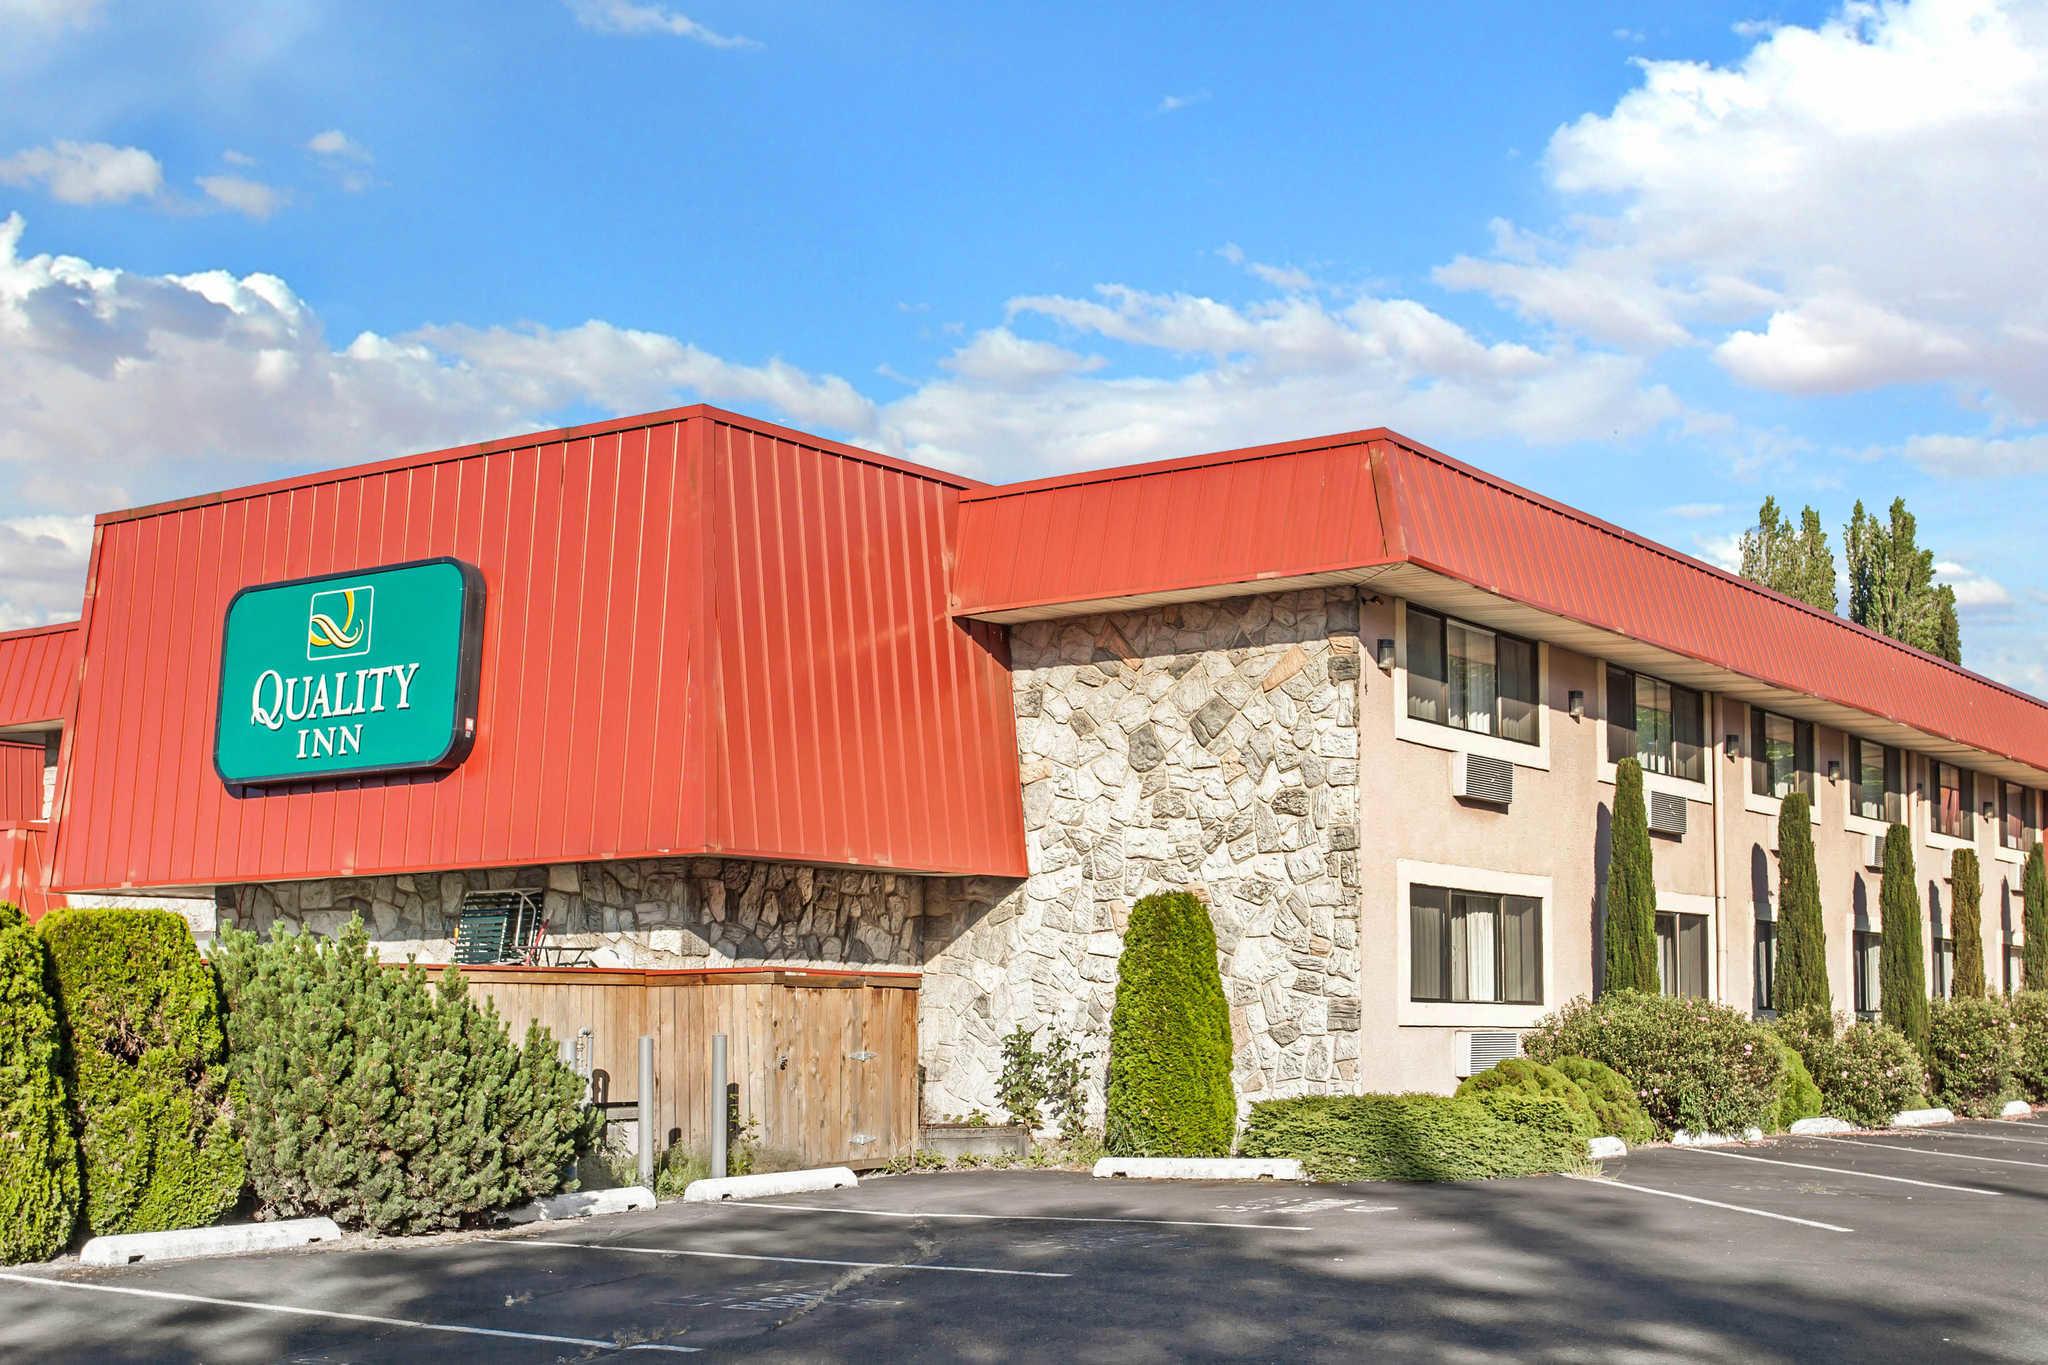 Olympia Wa Motels And Hotels